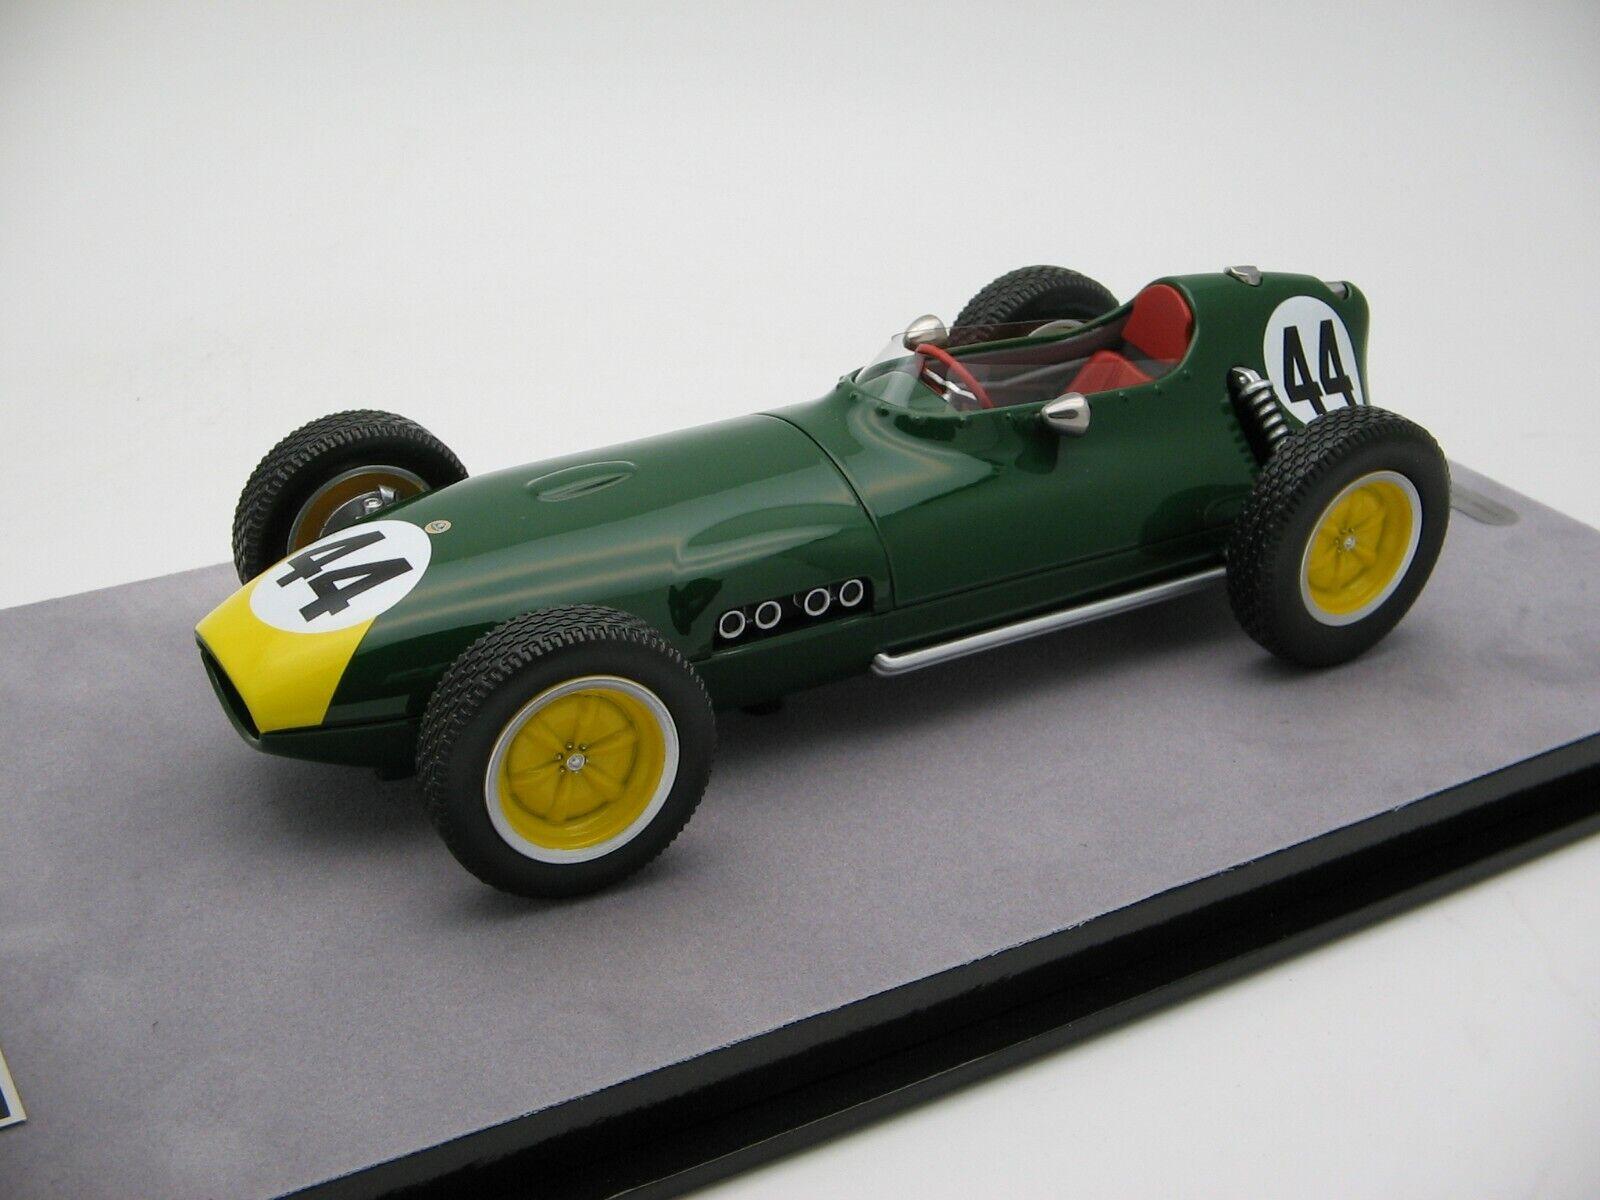 1 18 scale Tecnomodel Lotus 16 F1 Championship Monaco 1959 - TM18-123A